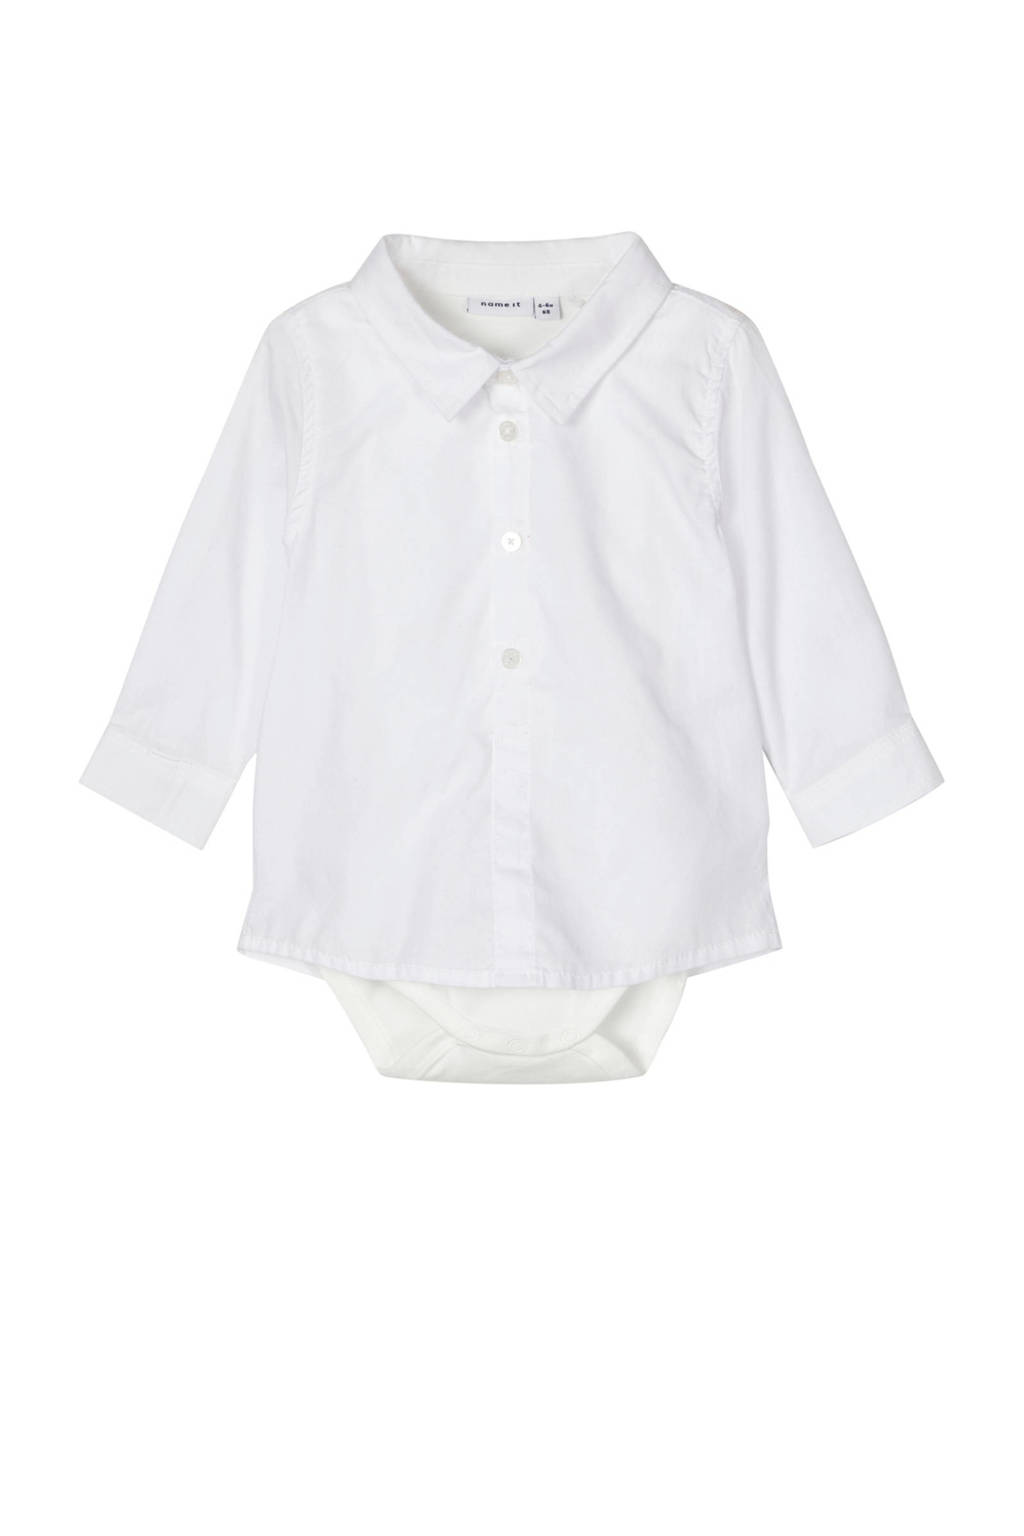 NAME IT BABY overhemd Sander met romper wit, Wit